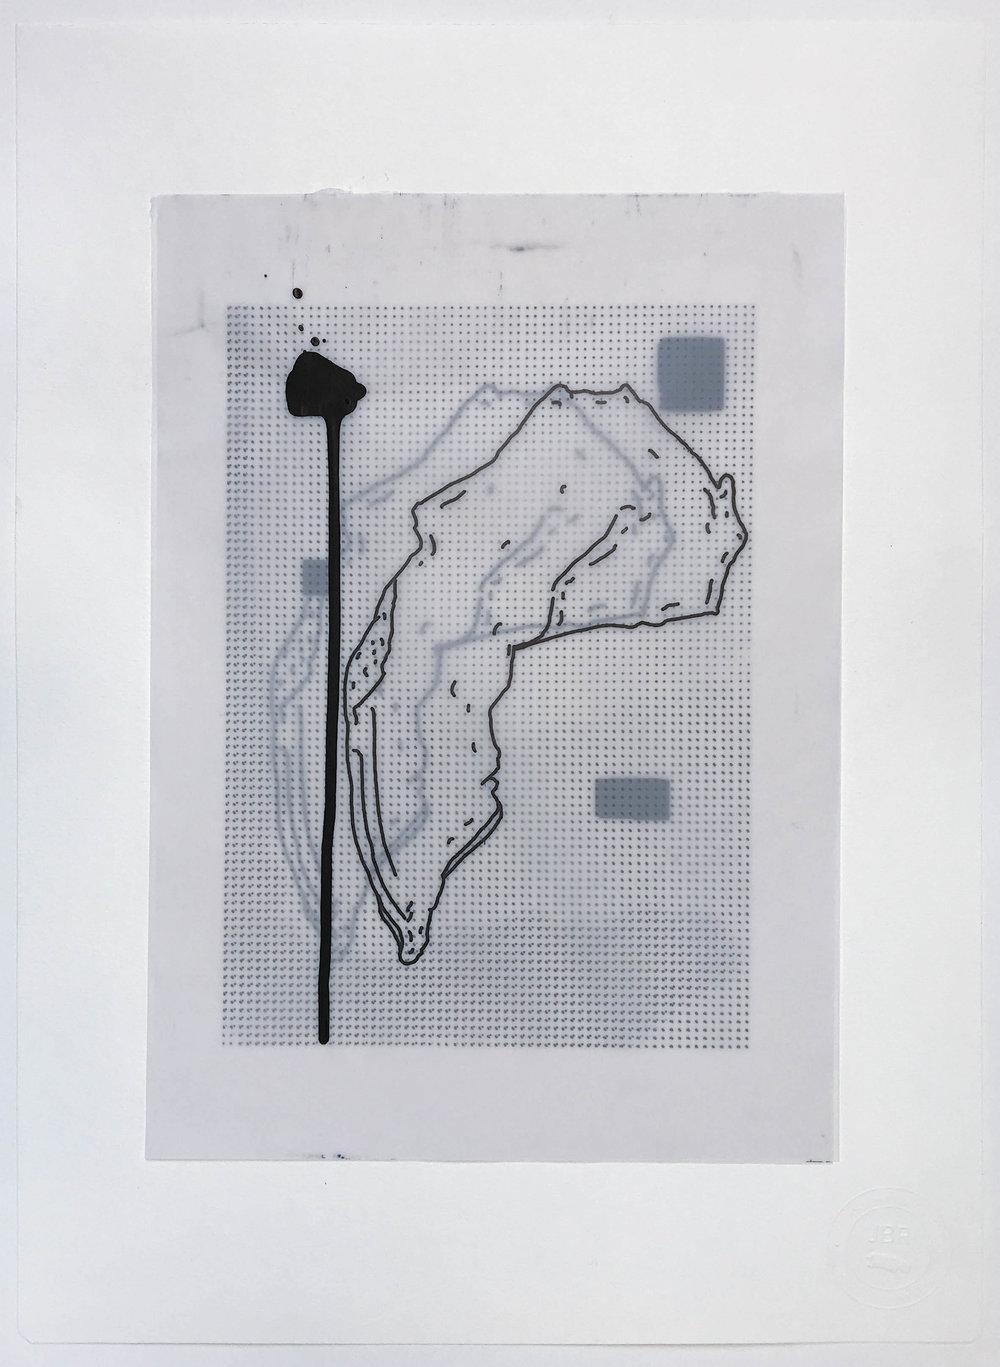 %22Corridas%22- Técnica mixta  - 42 x 30 cm - Julián Brangold - 2018.jpg